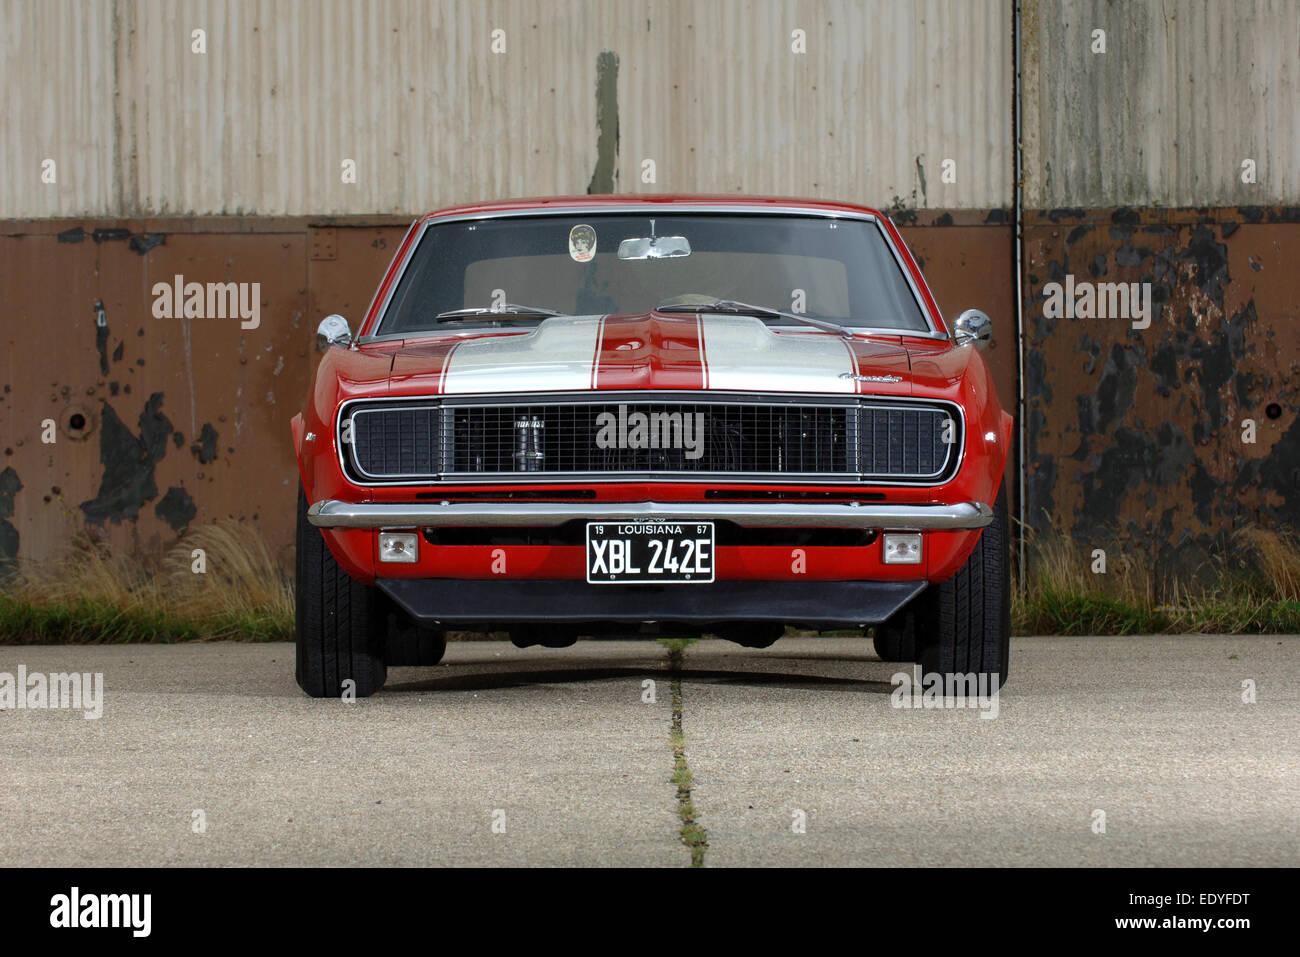 1967 Chevrolet Camaro American Muscle Car Stock Photo 77436852 Alamy